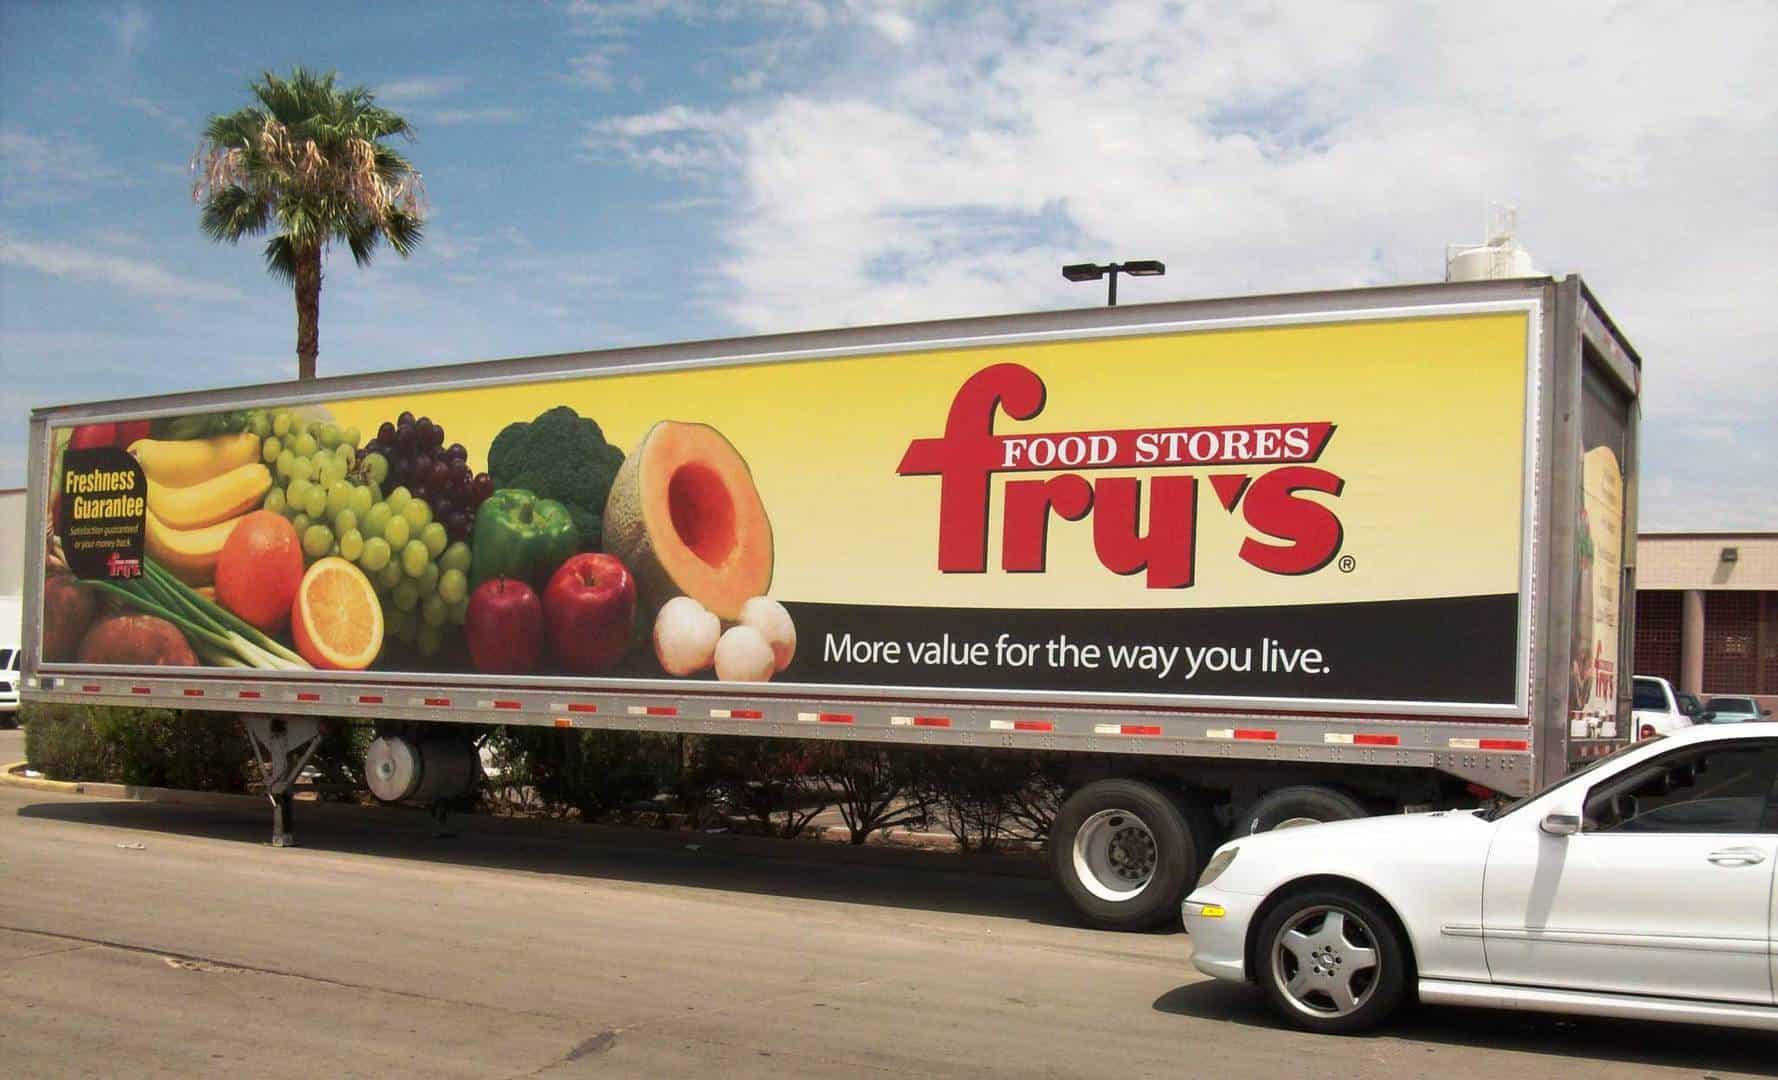 mobile billboard advertising system